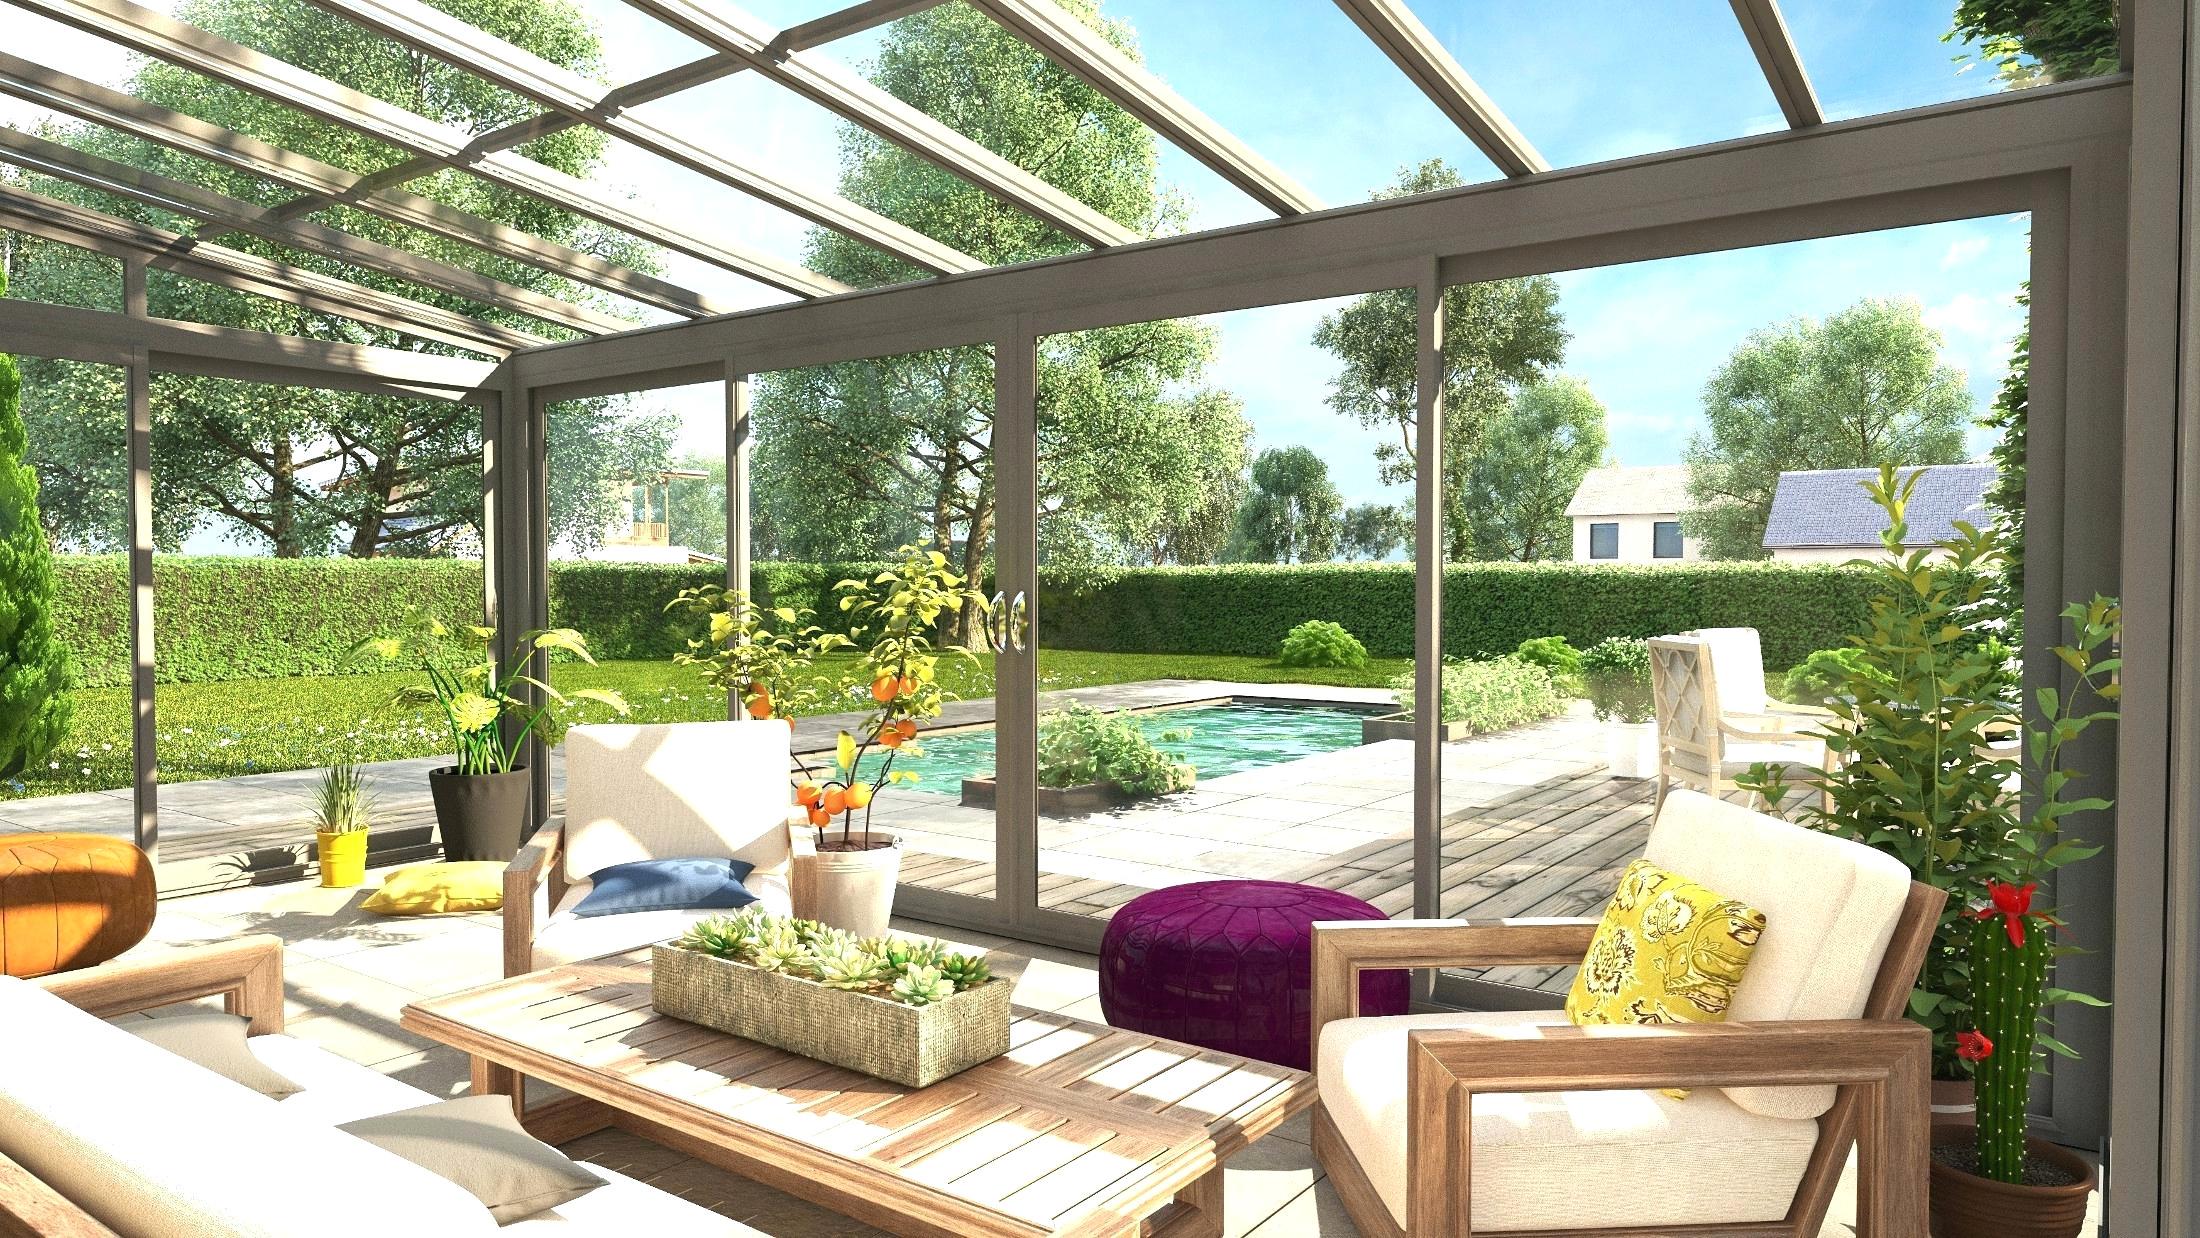 Veranda aluminium prix m2 - veranda-styledevie.fr